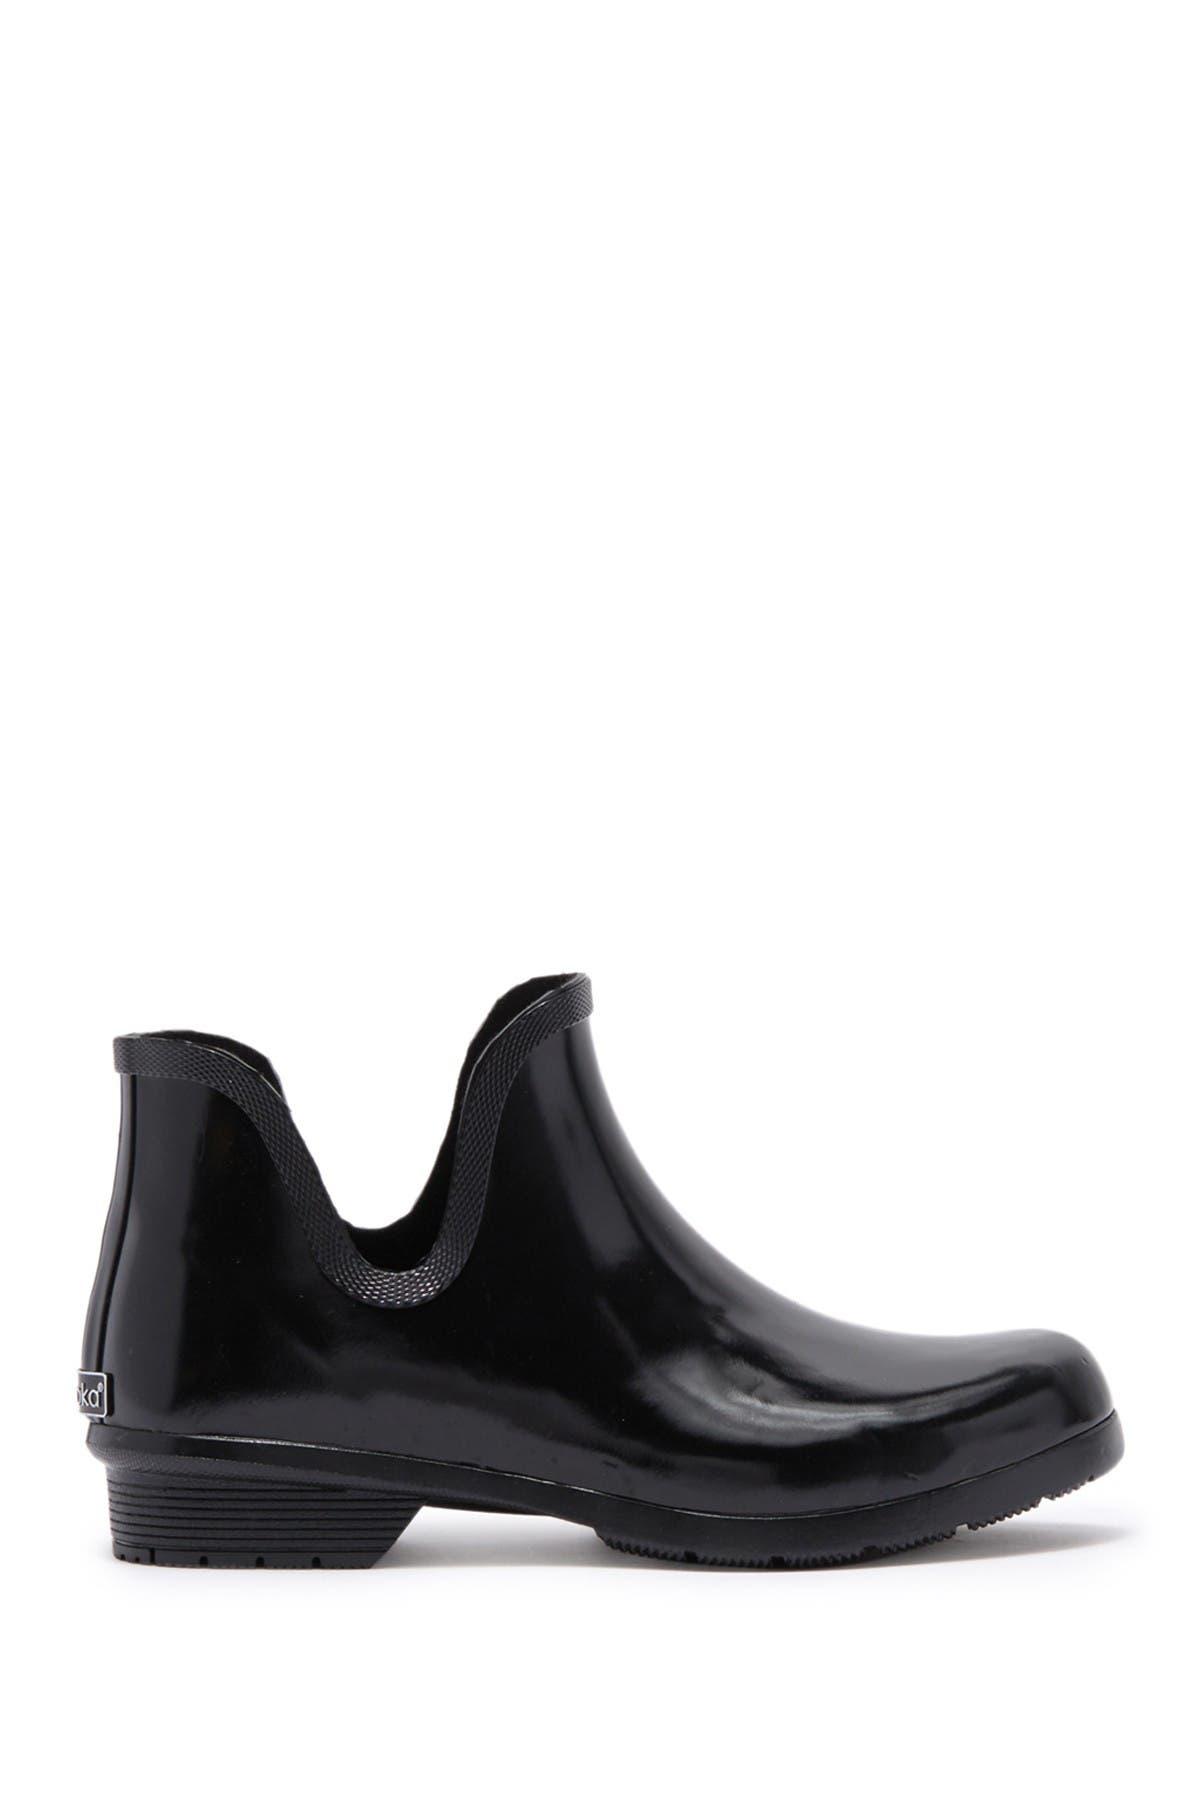 Image of Chooka Chelsea Lite Rain Boot